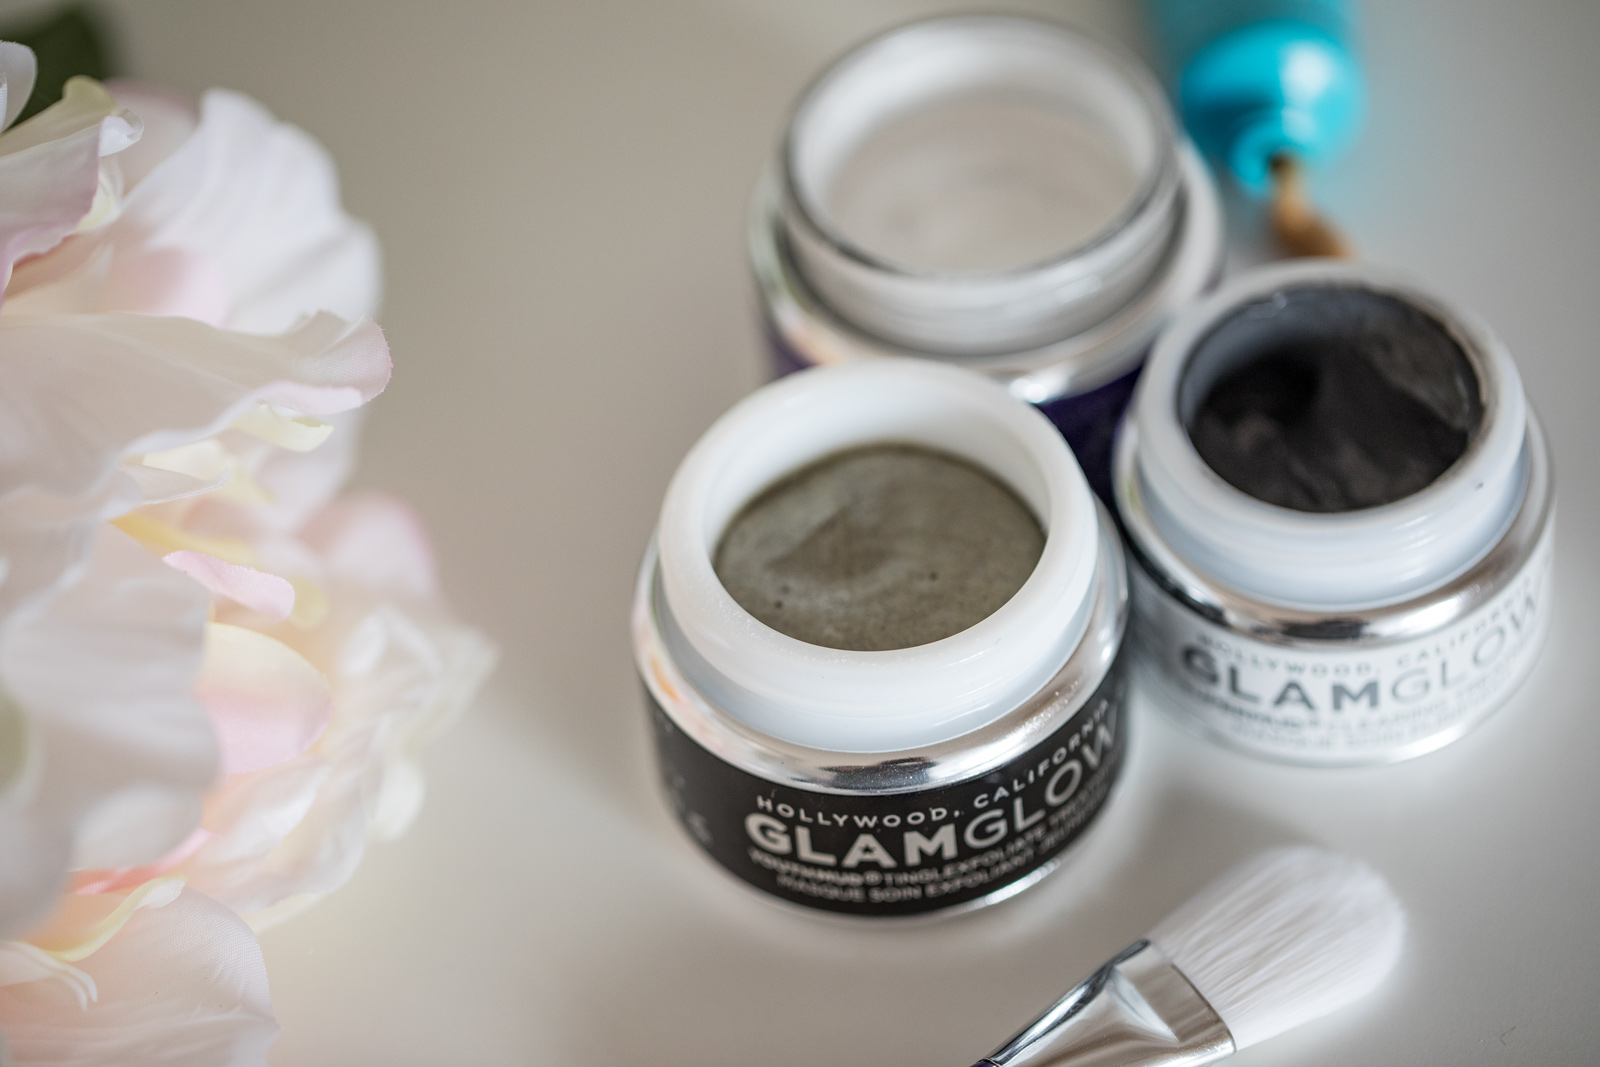 1600-shooting-nadja-nemetz-nadjanemetz-beauty-vienna-blogger-austrianblogger-violet-fleur-violetfleur-beautyblogger-origins-glamglow-matchamaske-matchamasque-matcha-maske-masque-glamglowmaske-glamglow-maskenparty-beautytag-hautpflege-4